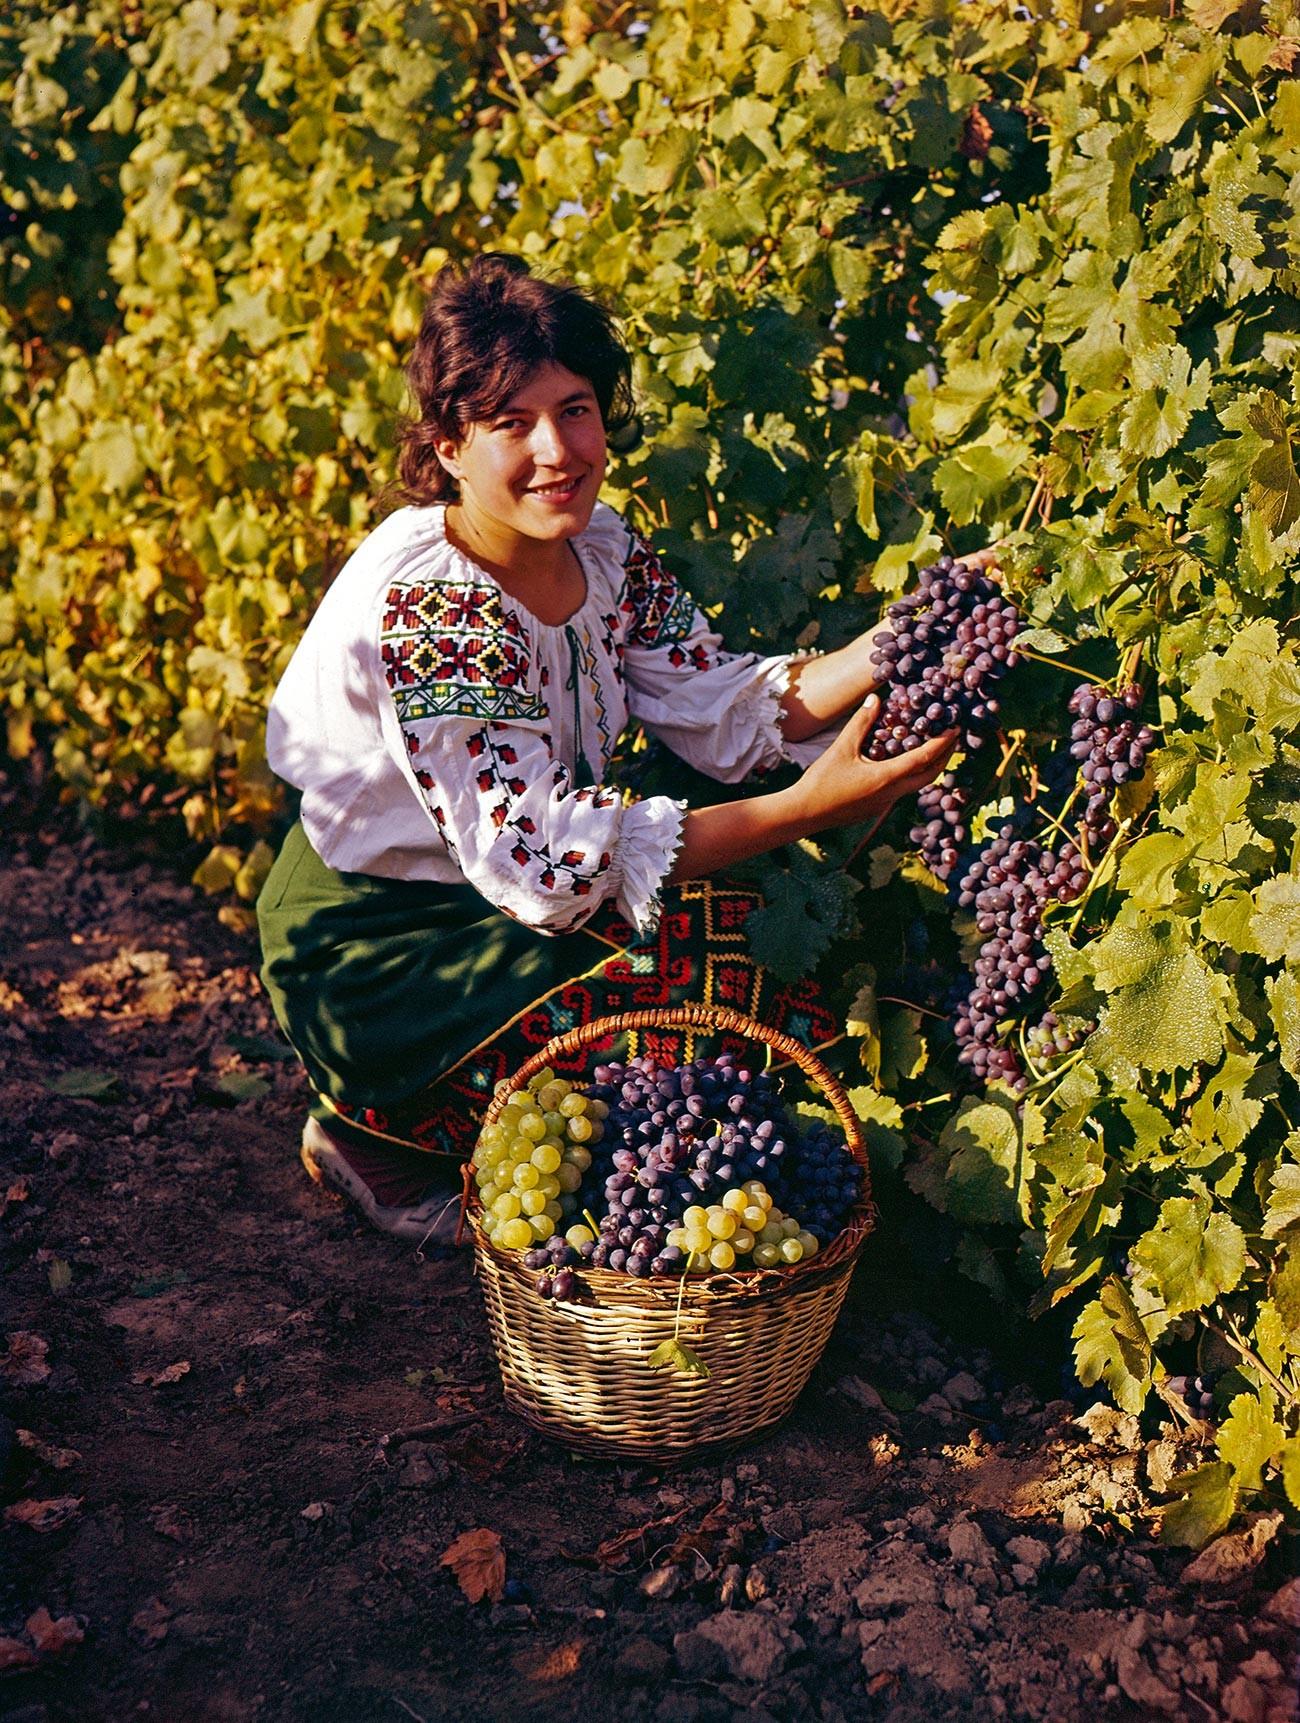 Берба винограда у Молдавској ССР, 1972.